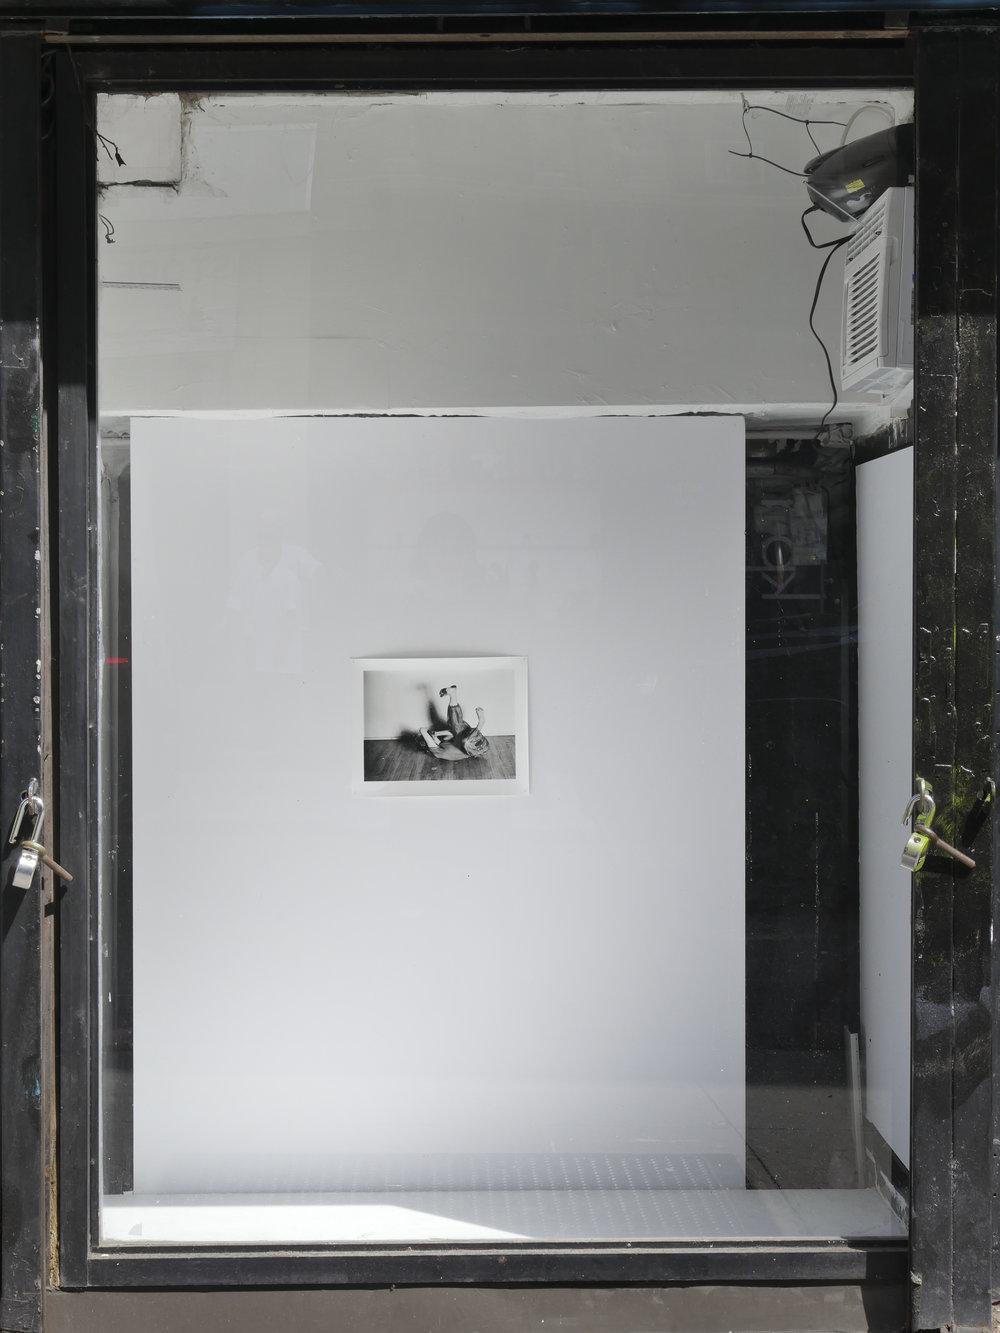 Installation view, Pooh Kaye: Object Actions 1975 - 1980, STL, NY, 2017